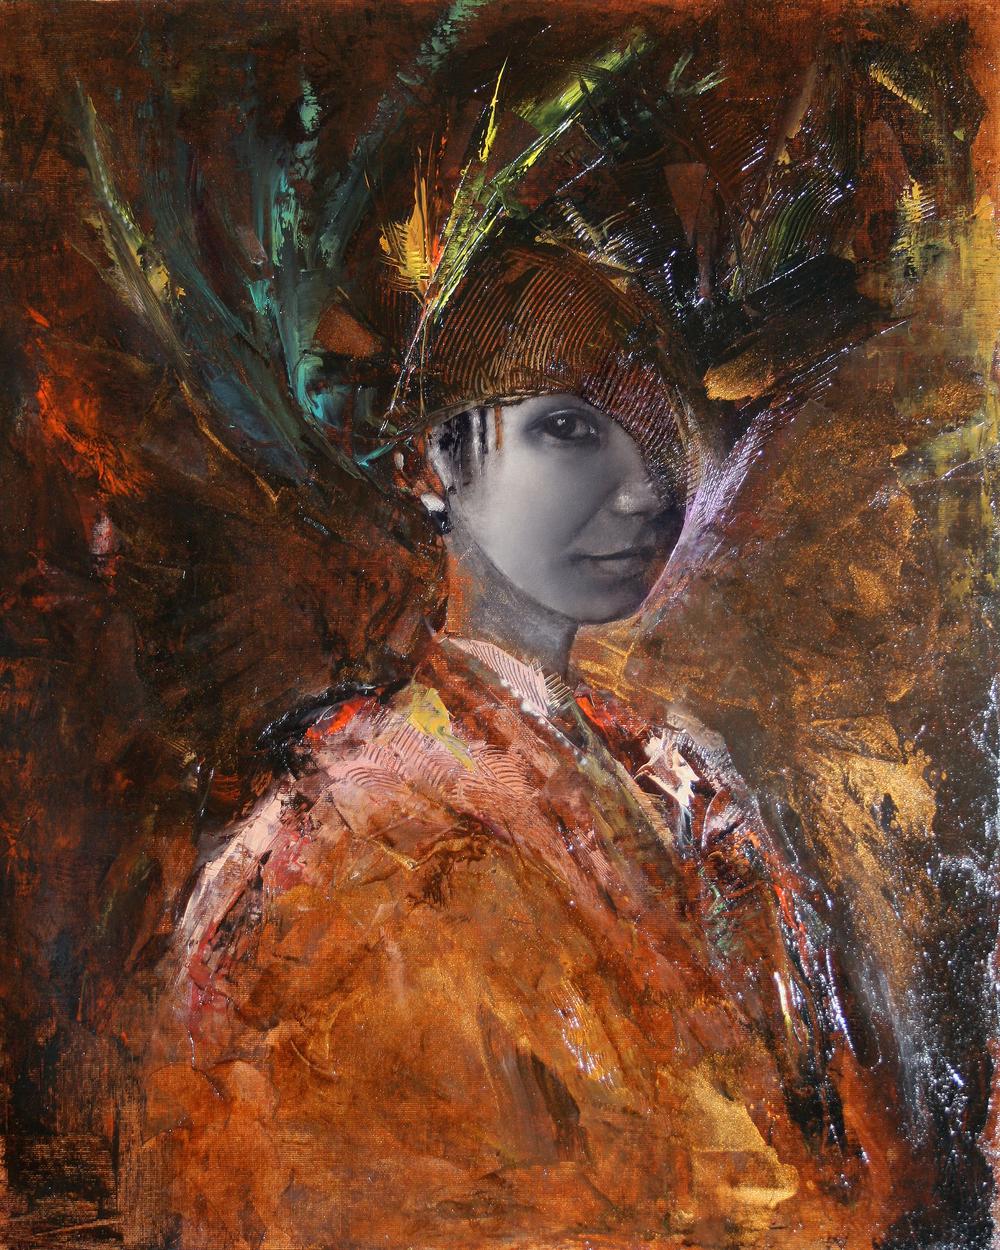 Overlay Series Vol. 1 Artwork by Miki Foldi